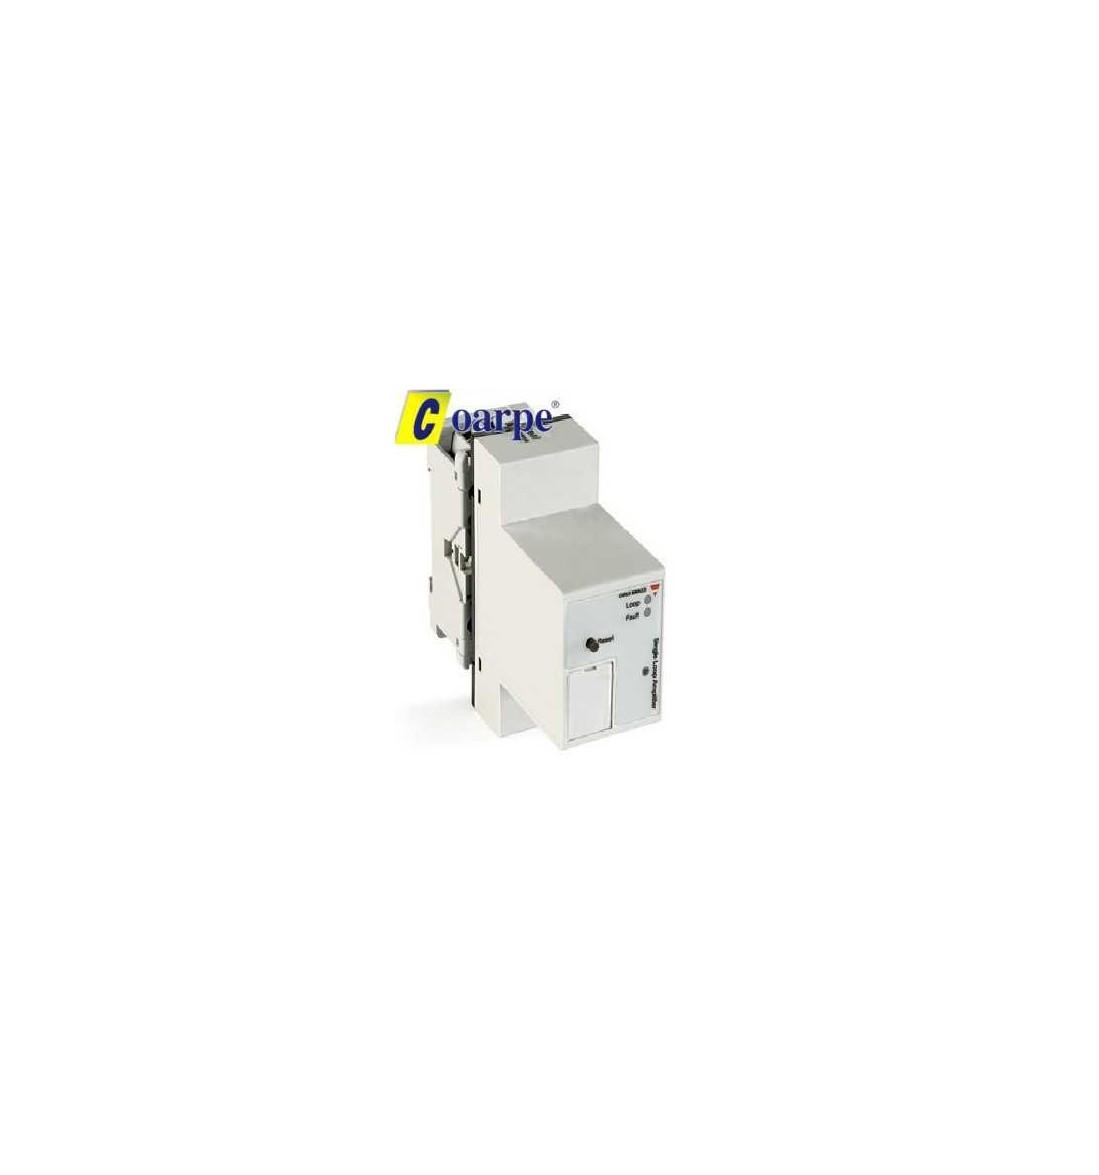 Detector de bucle magnético LBUC1